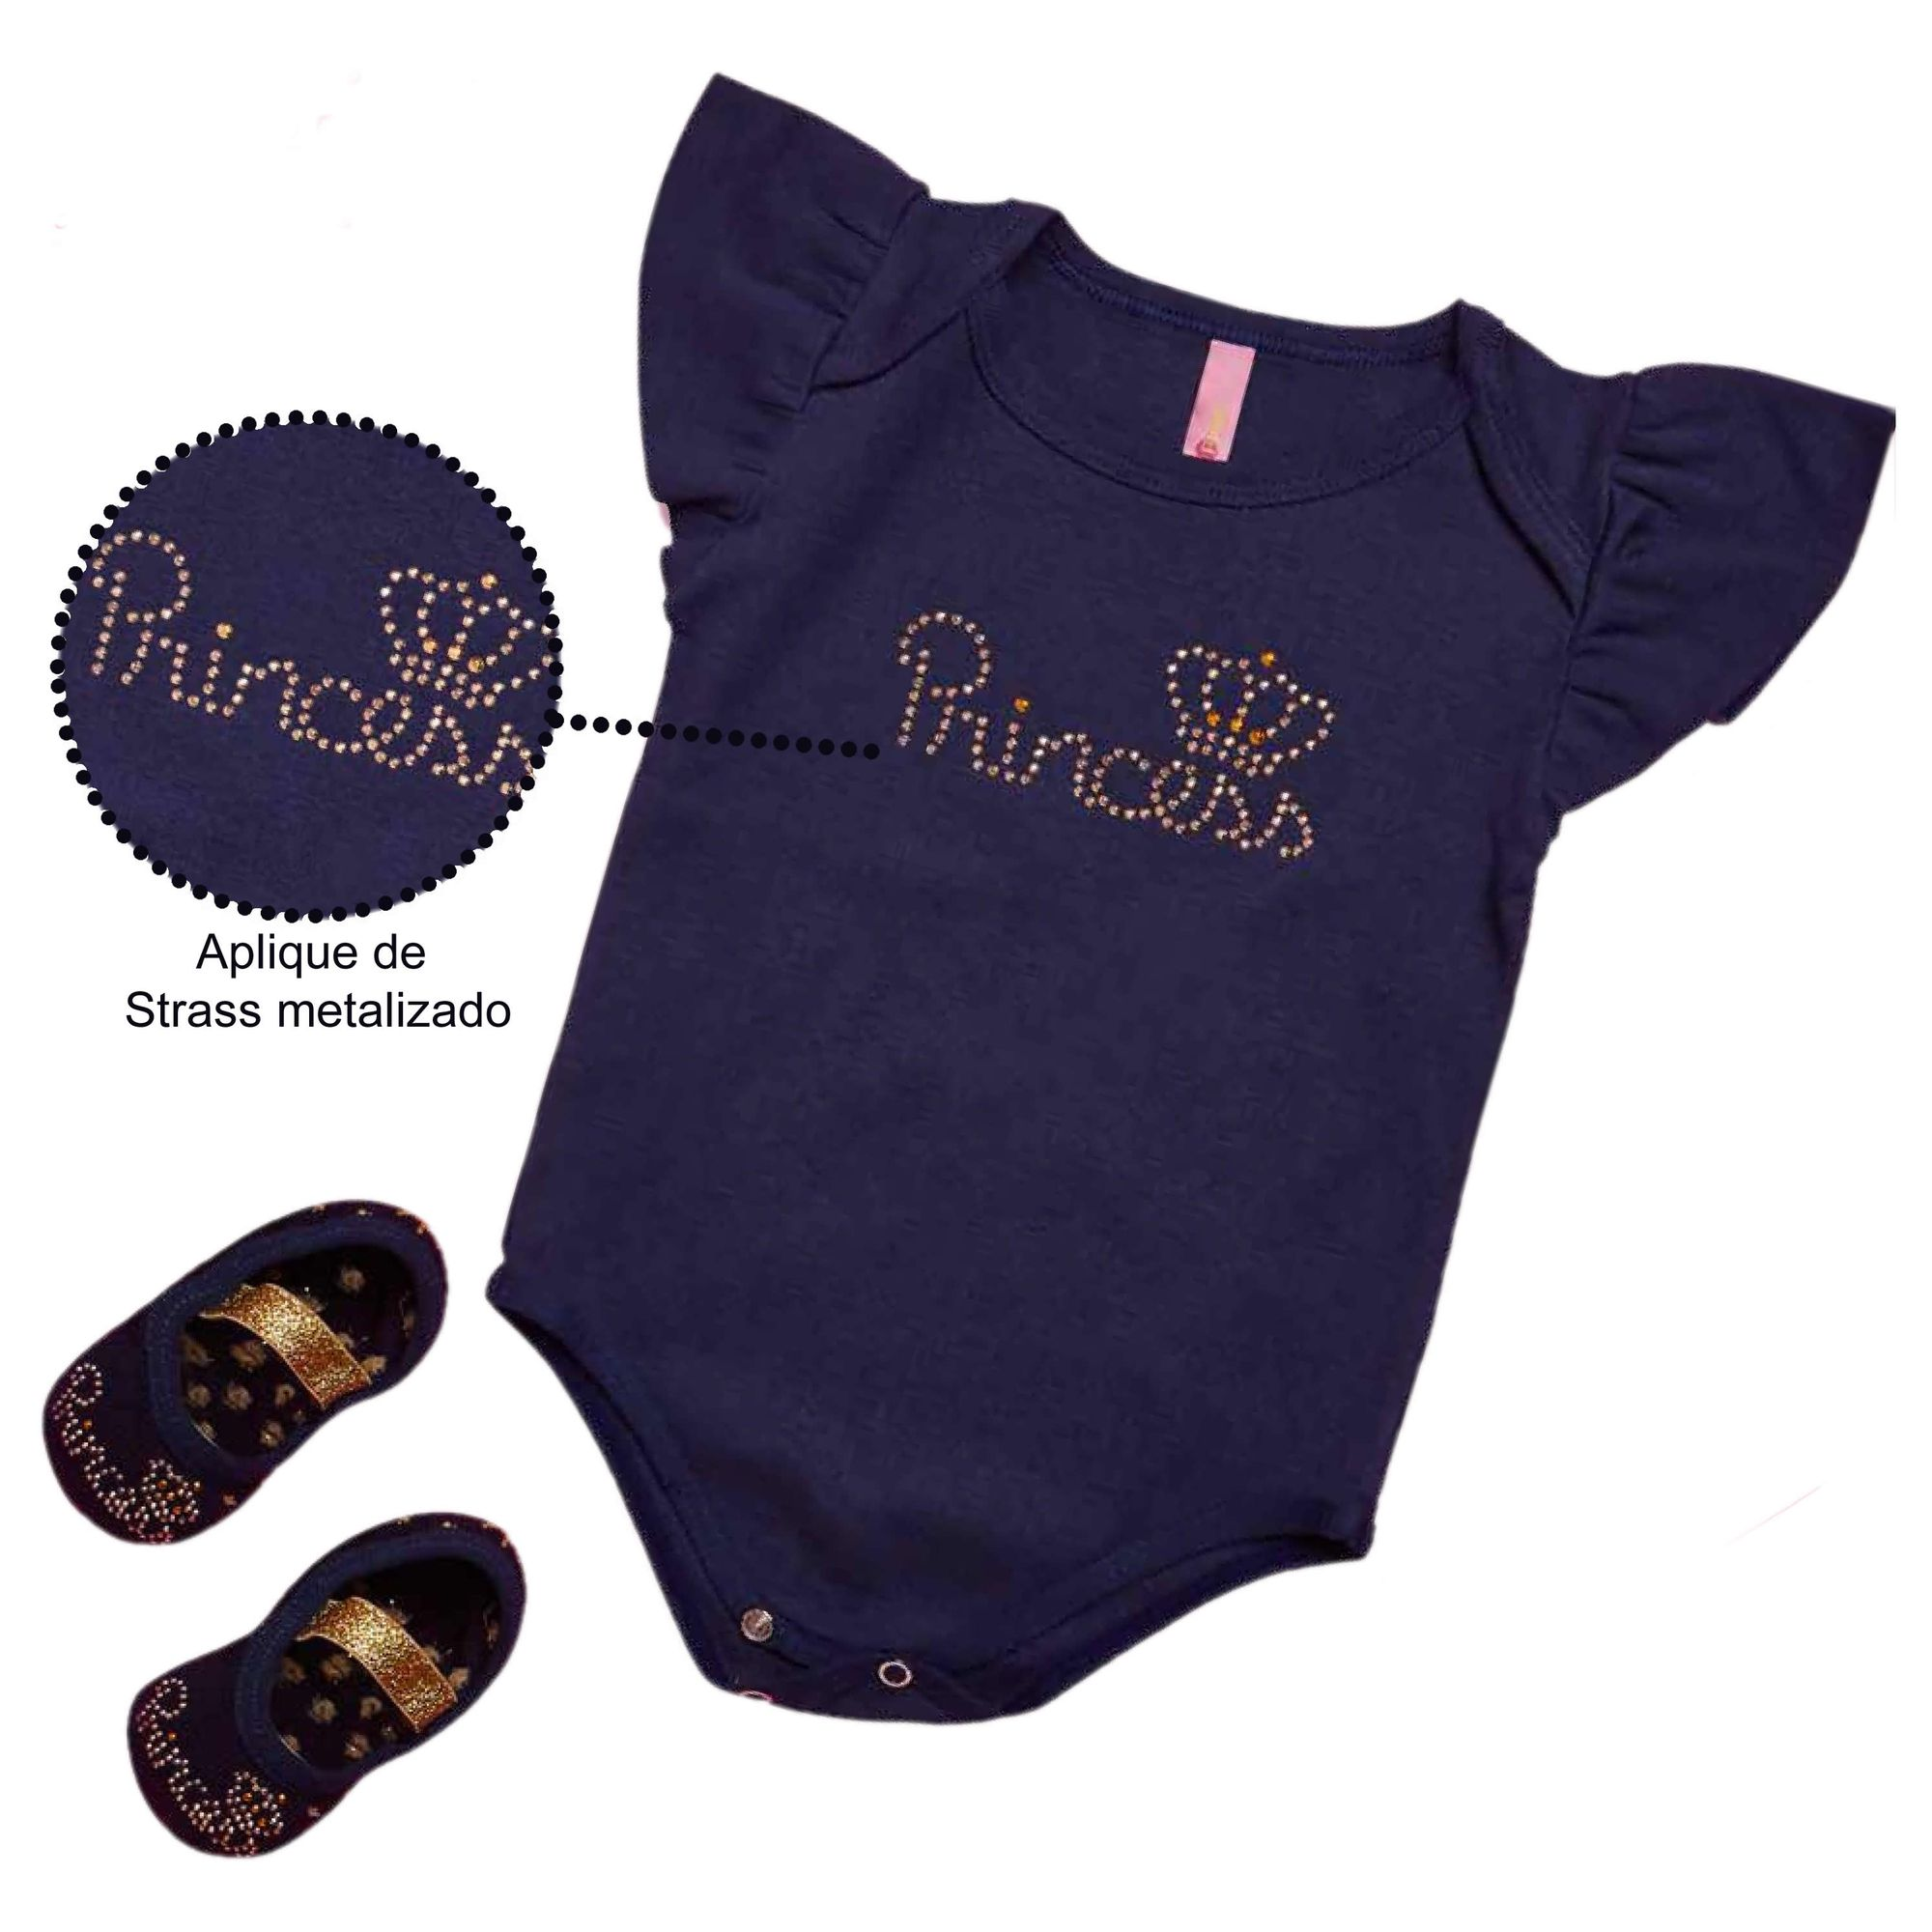 kit-body-bebe-meia-sapatilha-azul-marinho-princesa-puket